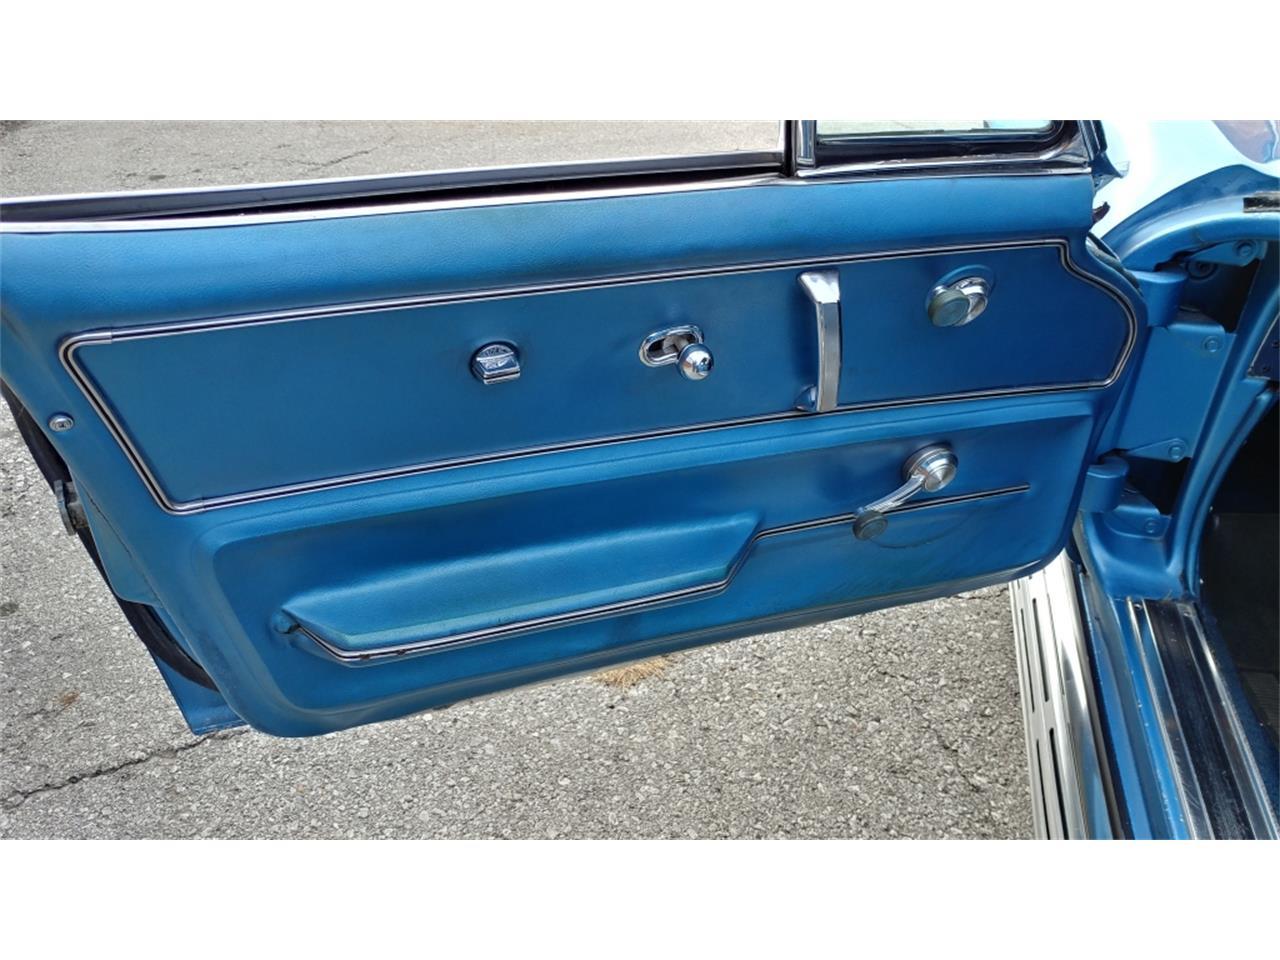 Large Picture of '67 Chevrolet Corvette - $69,500.00 - MO2L